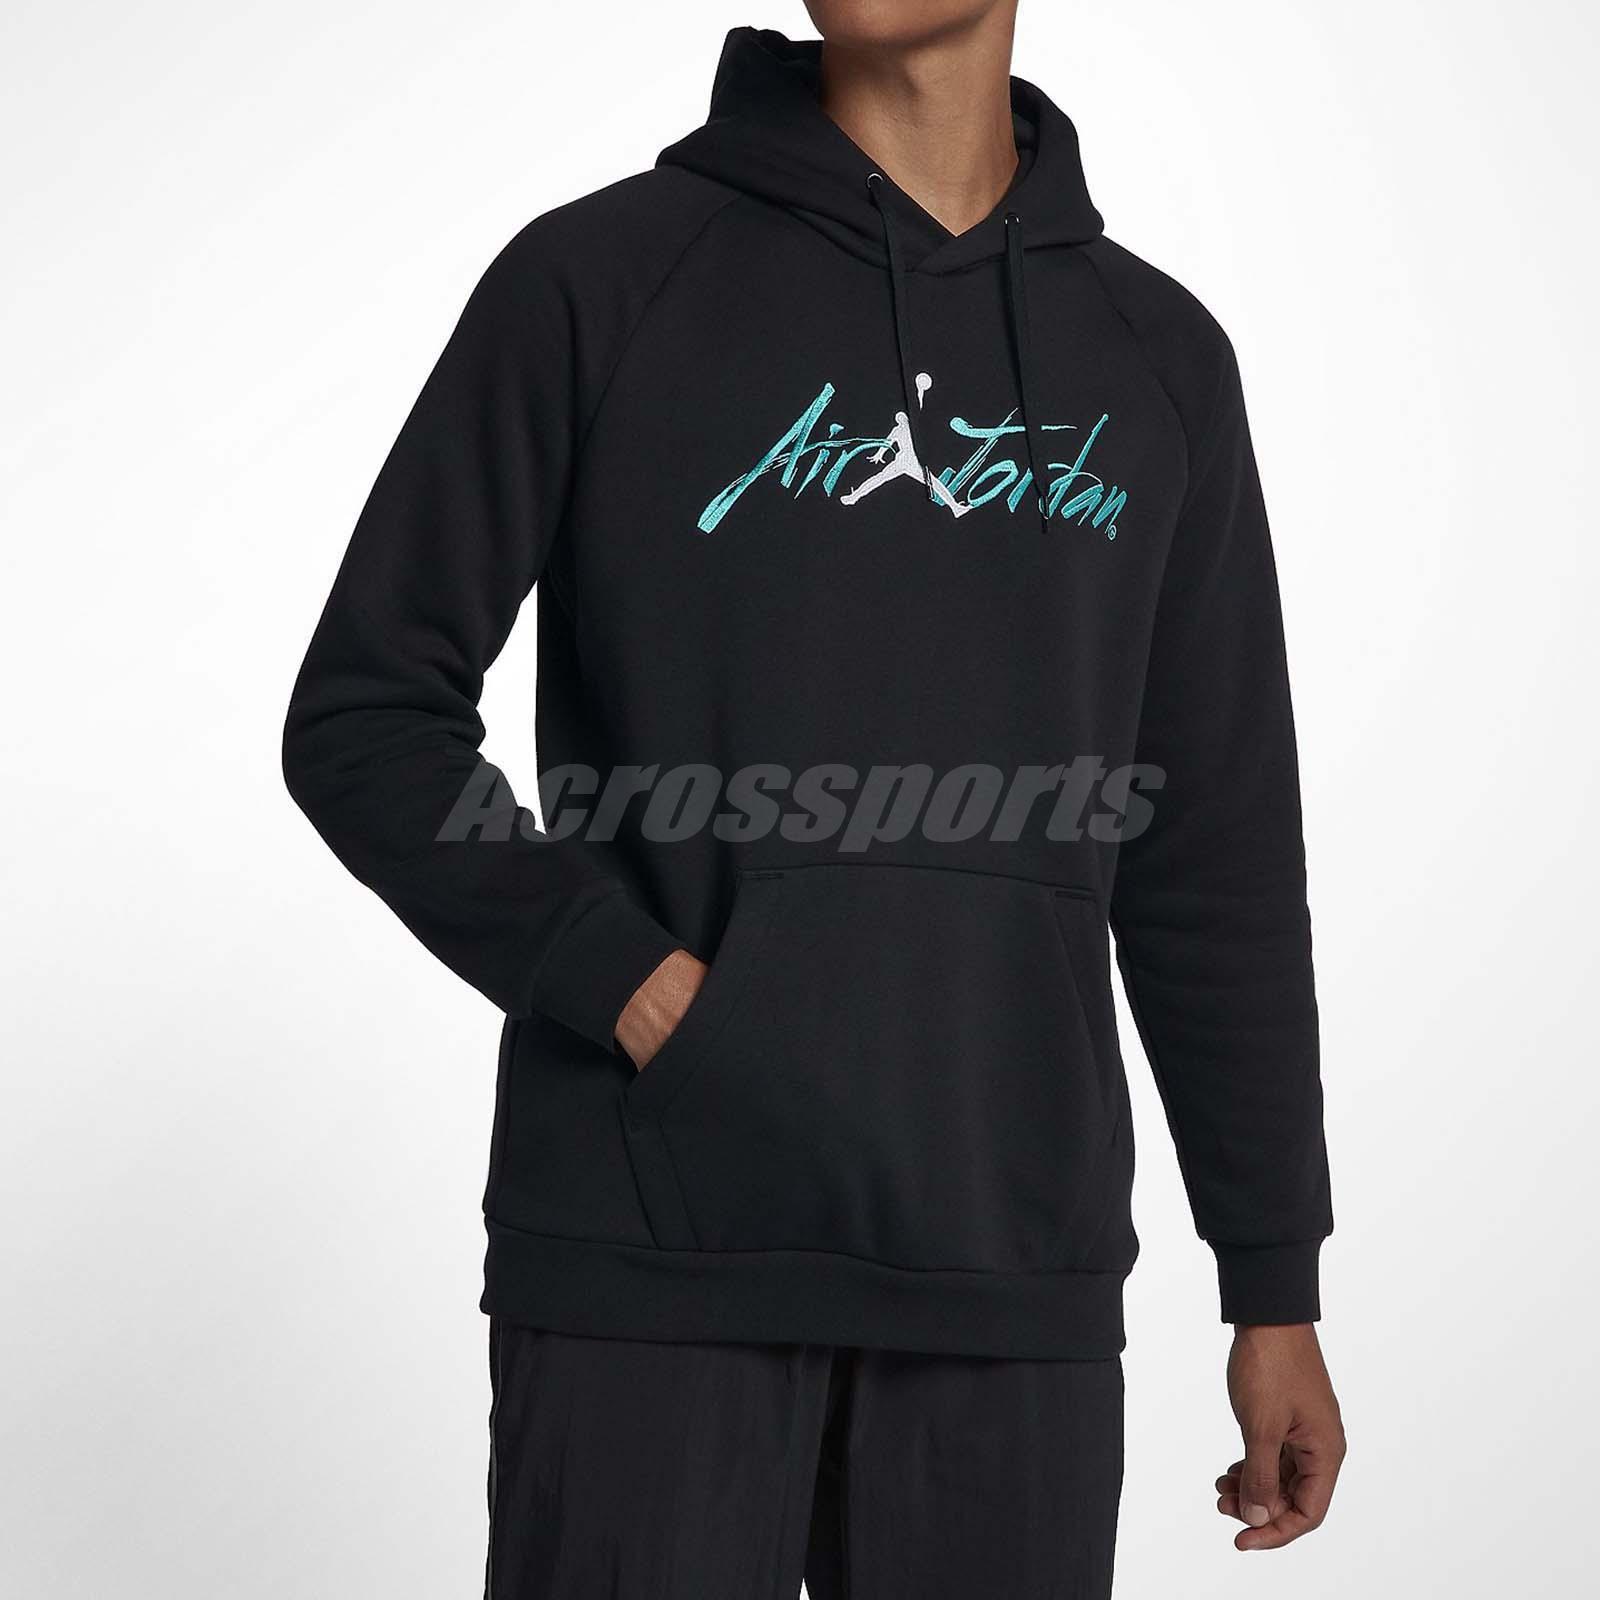 3de1643506c7 Details about Nike Air Jordan Greatest Jumpman Pullover Hoodie Fleece  Sports Black AV6006-010